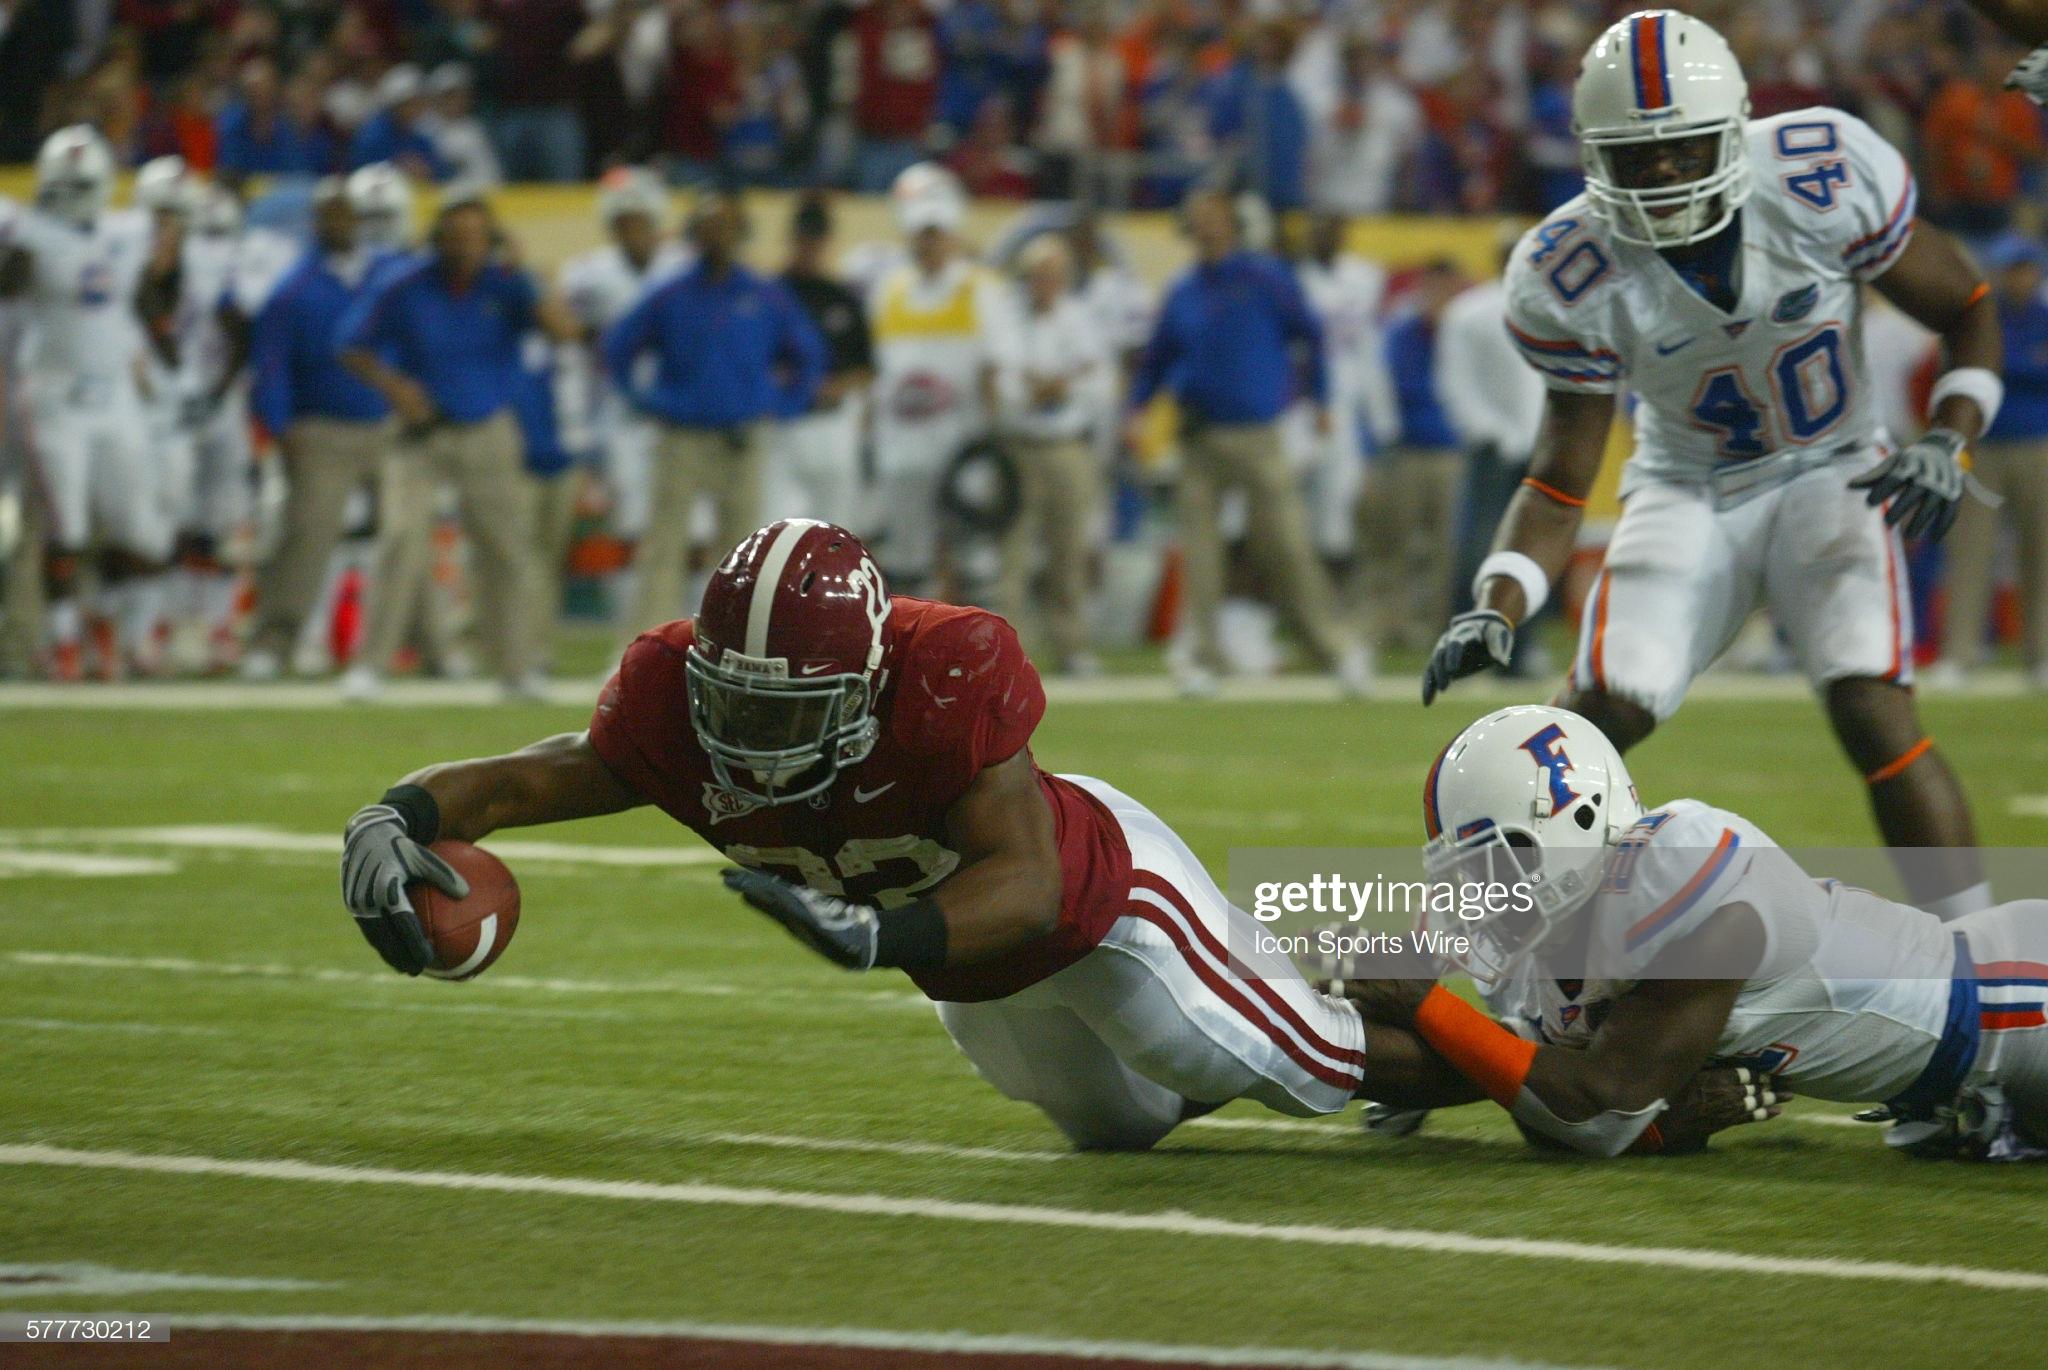 10-Year Anniversary: Alabama Tops Florida for SEC Title, Lawrence Kicks Texas to Big 12 Title